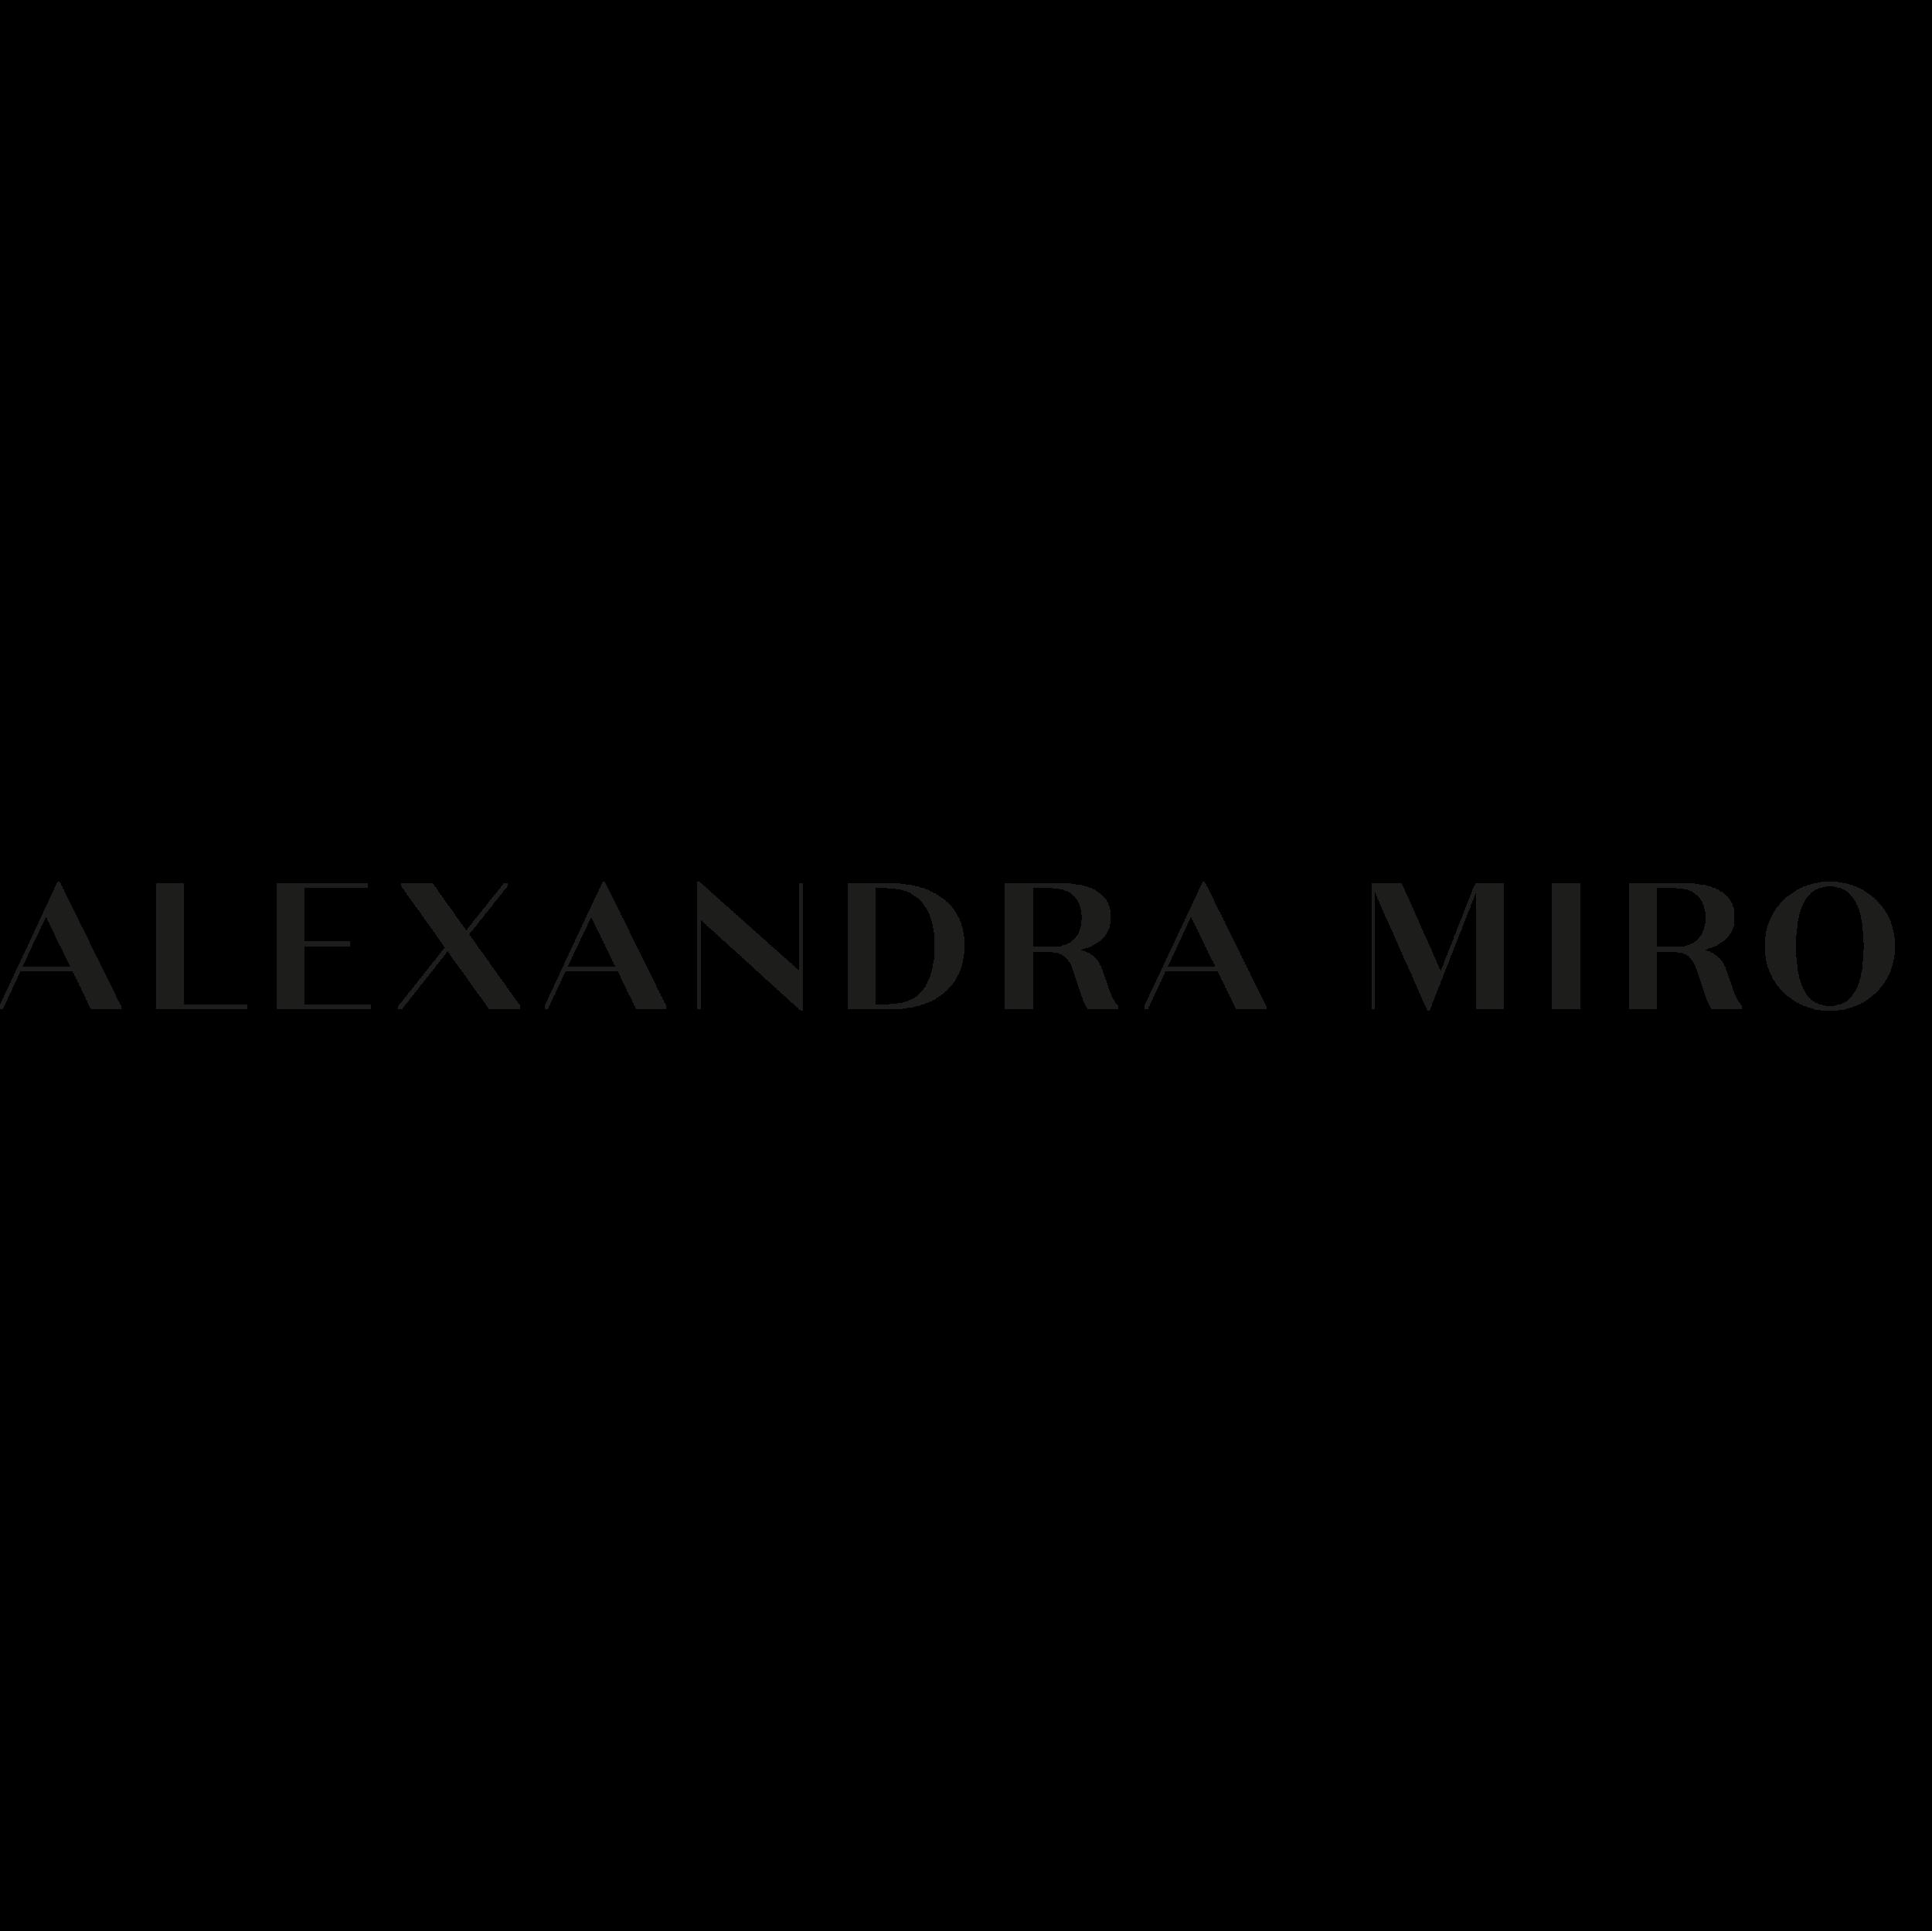 ALEXANDRA_MIRO_logo_master_BLACK.png